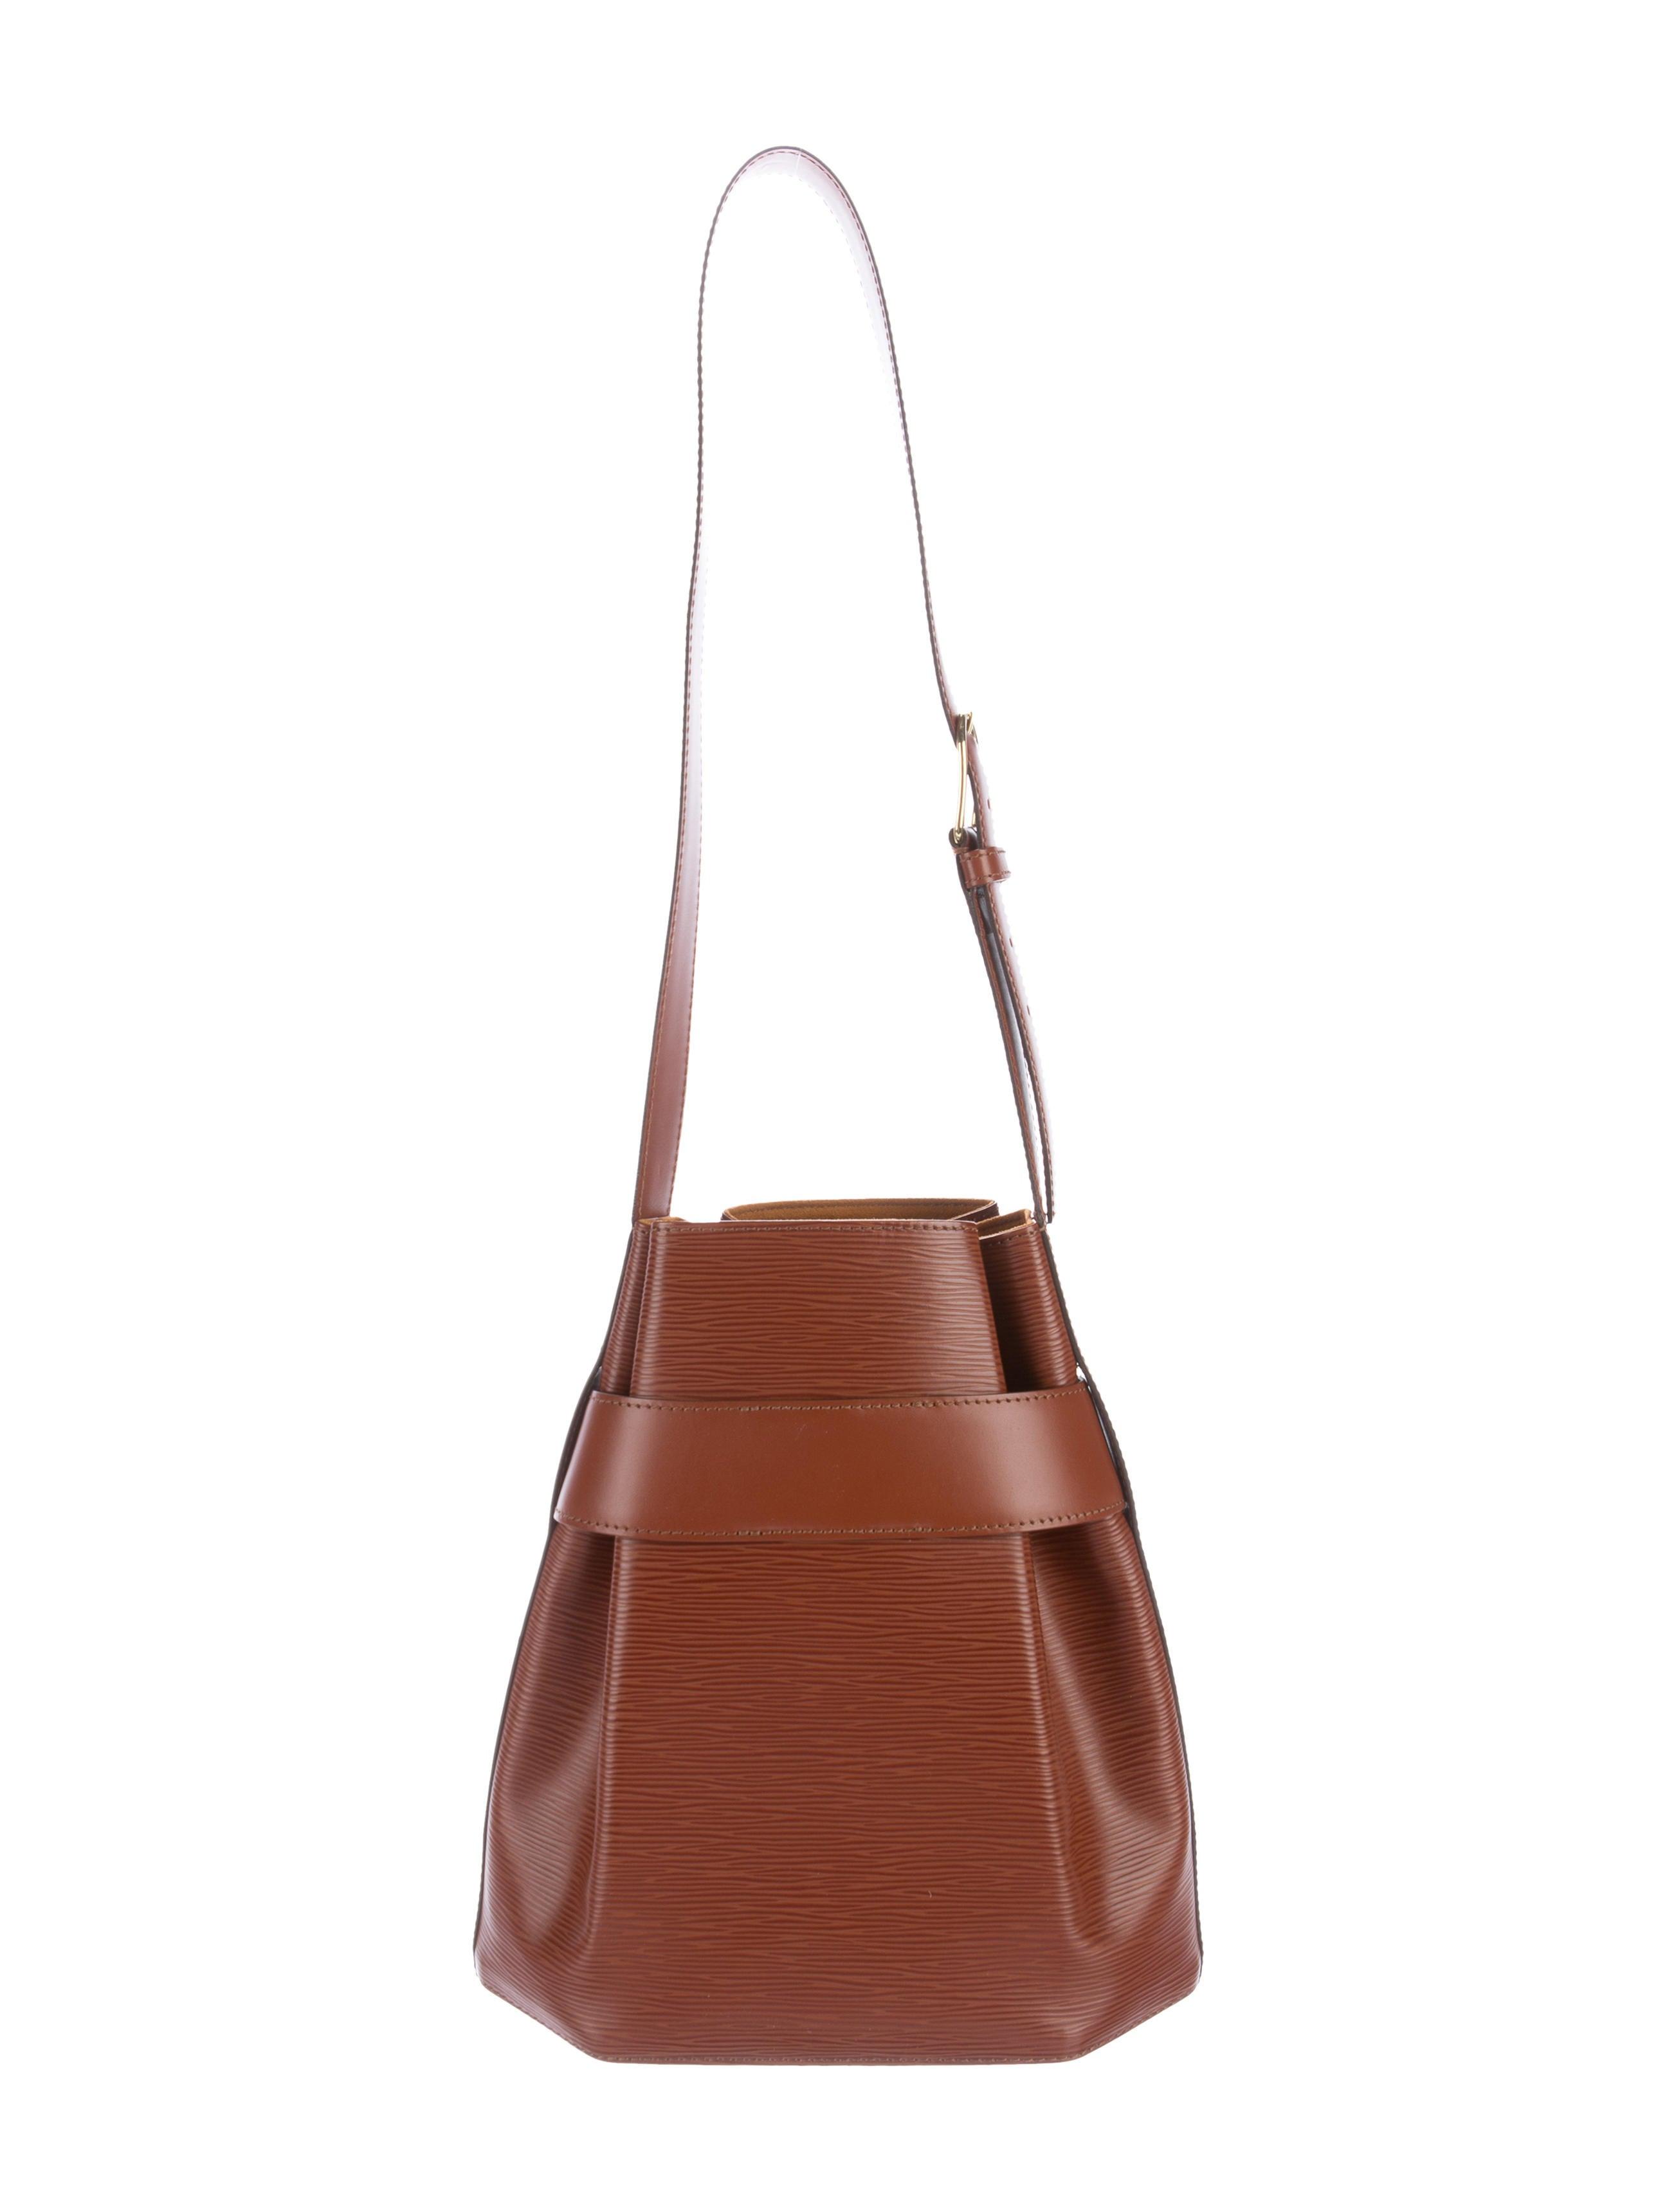 Sac Louis Vuitton Vrai : Louis vuitton epi sac d epaule pm handbags lou